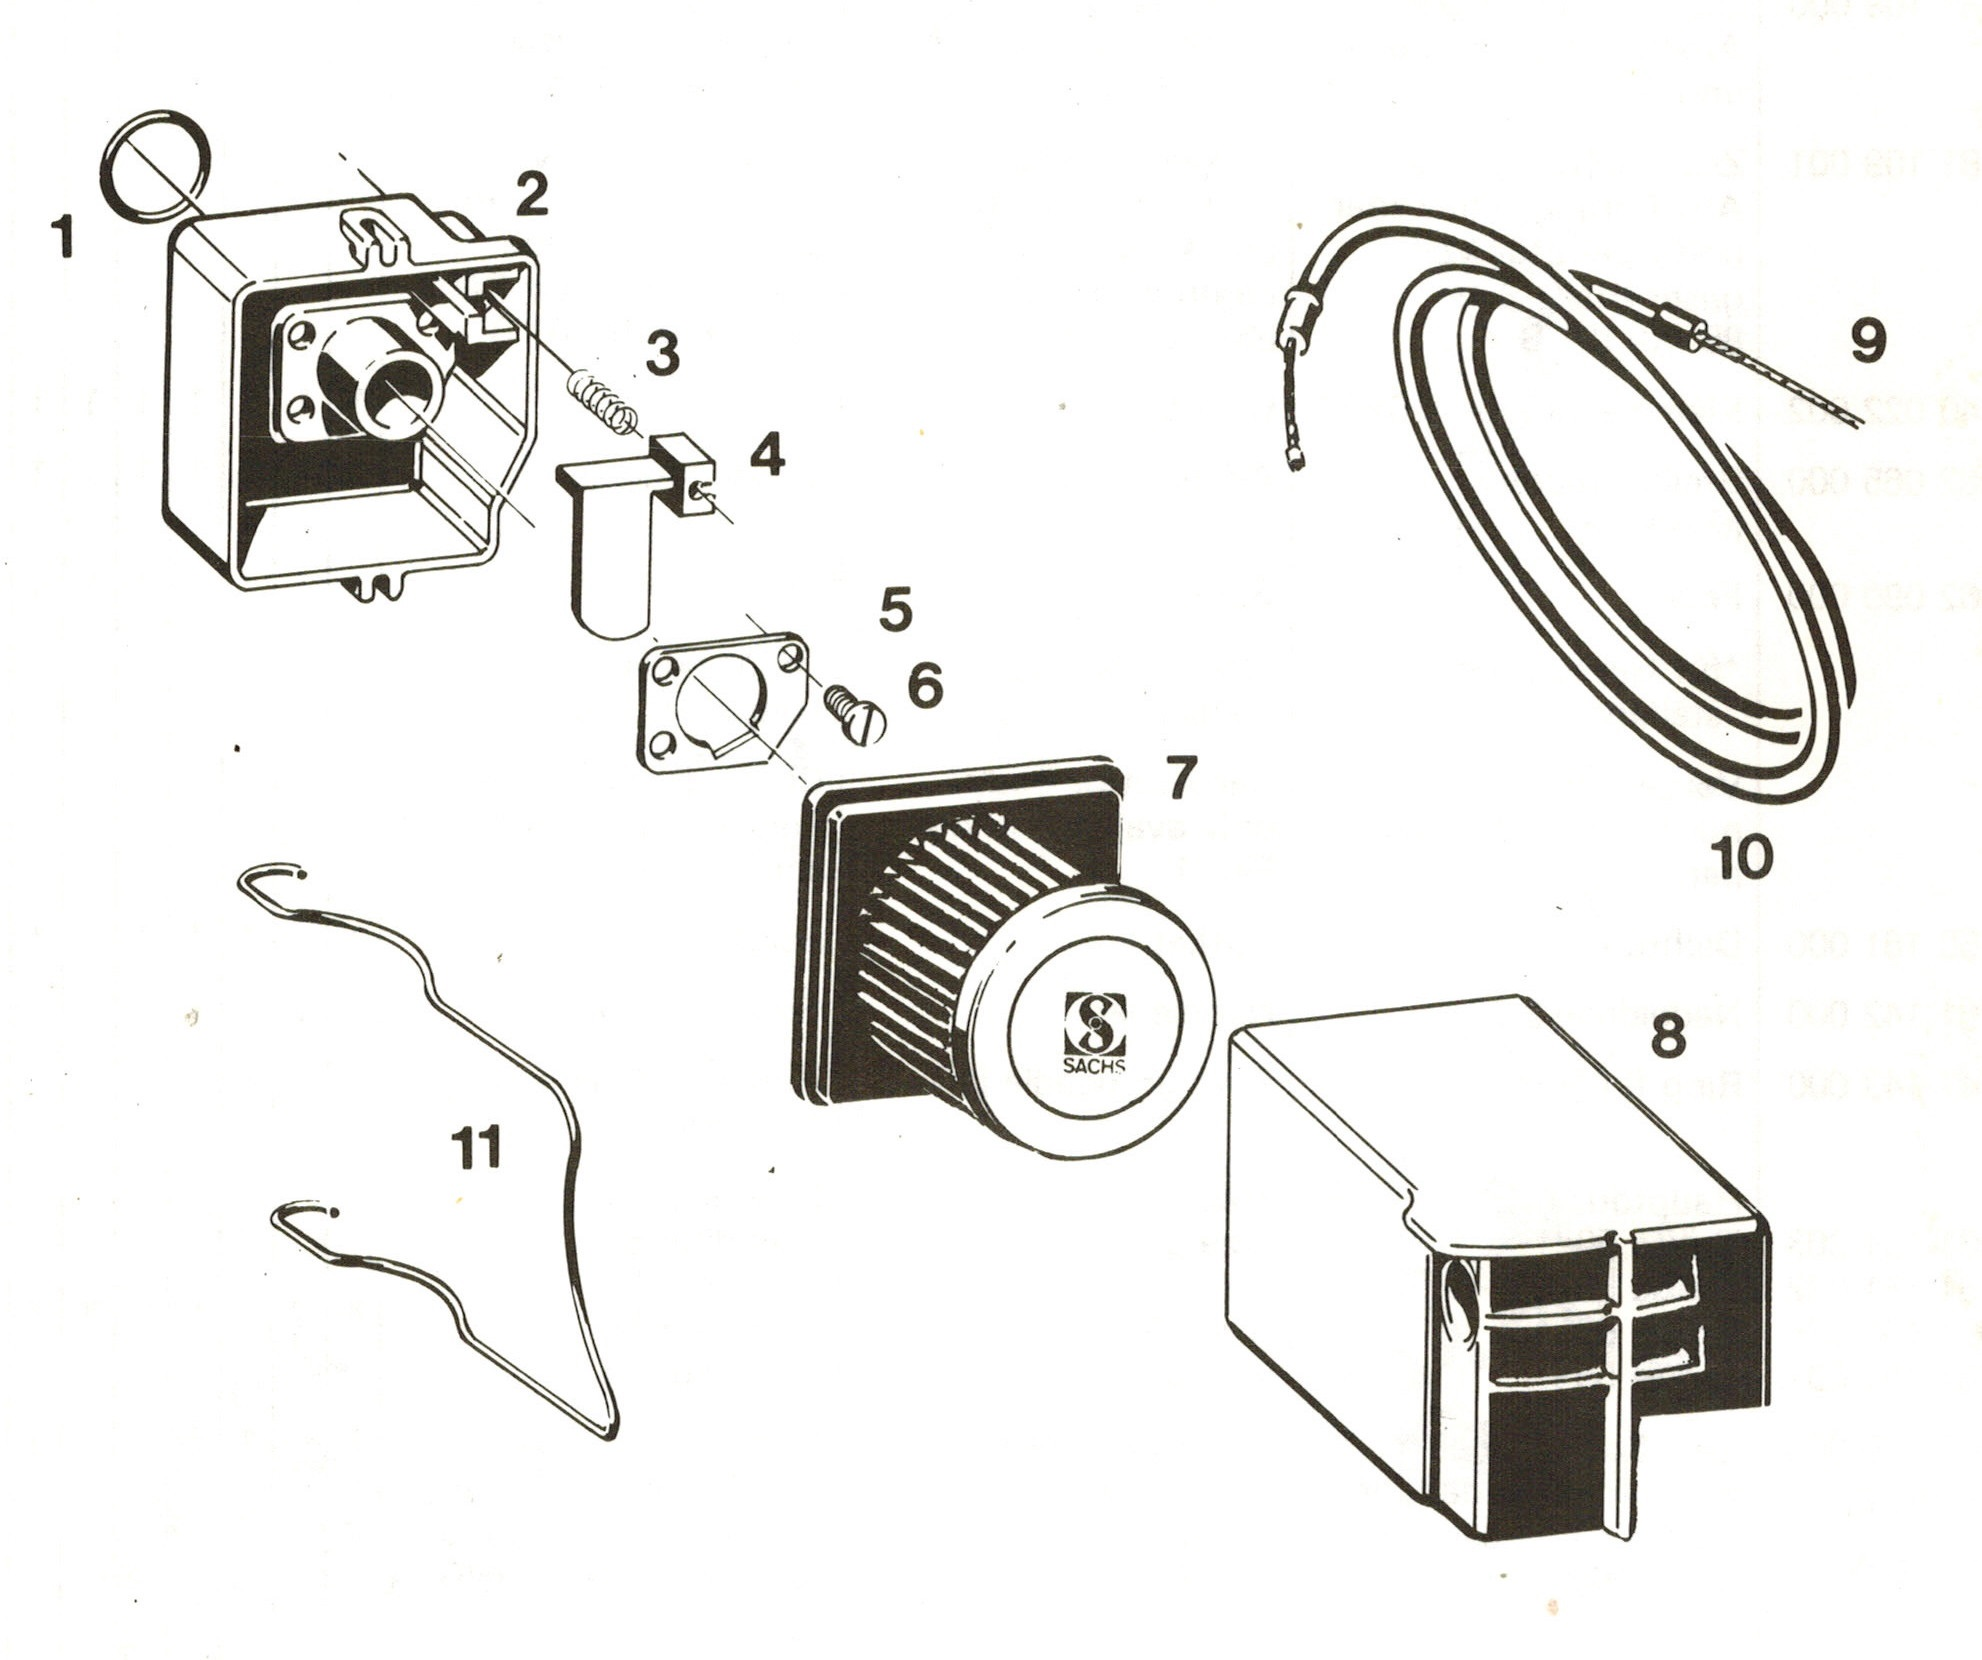 moped hercules prima m sachs 504 505 vergaser. Black Bedroom Furniture Sets. Home Design Ideas